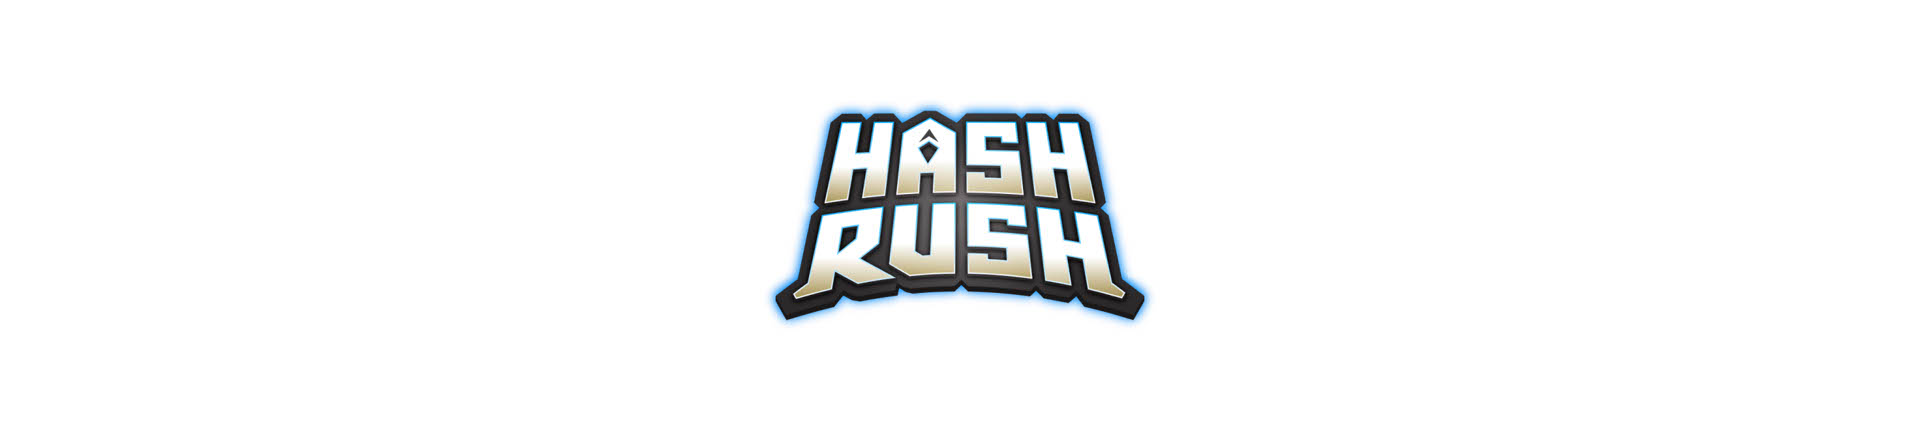 <a href='https://www.mightygamesmag.de/all-game-list/hash-rush/'>Zum Spiel</a>